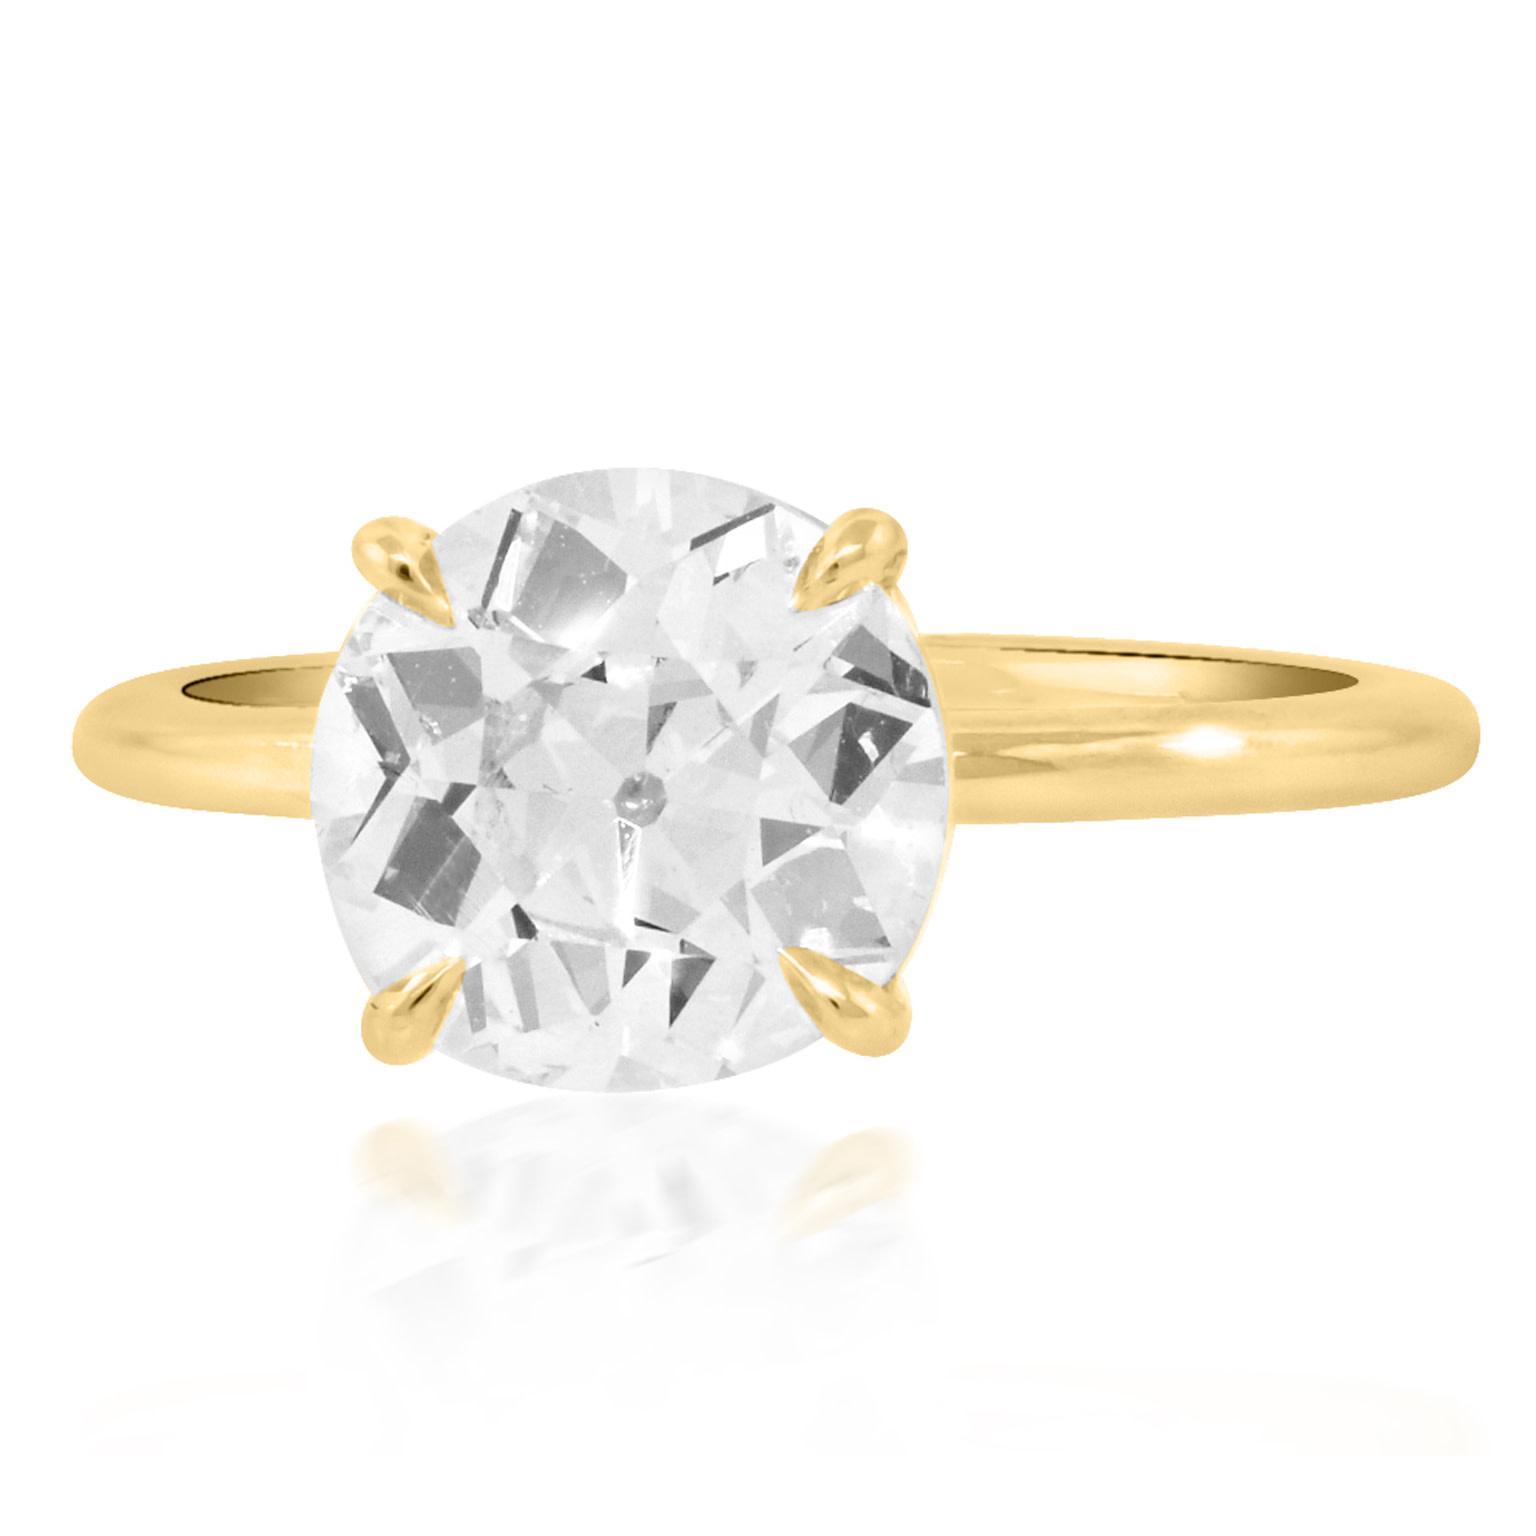 Trabert Goldsmiths 2.04ct KVS2 Old Euro Cut Diamond Aura Ring